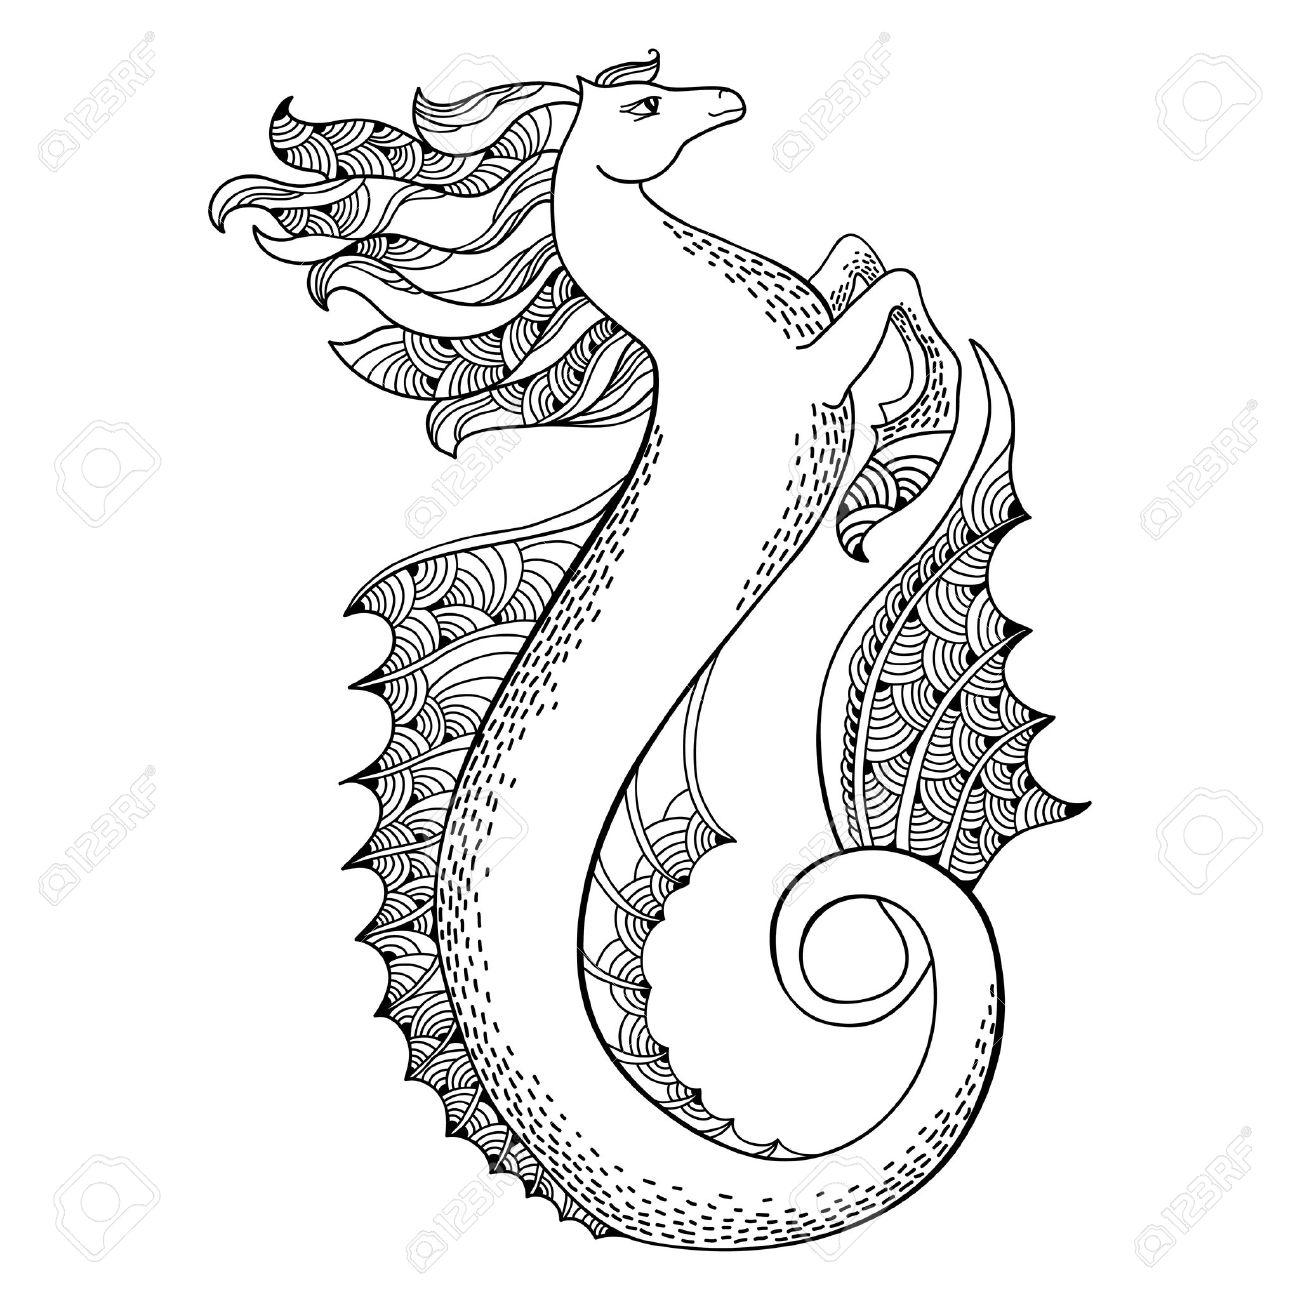 mythological hippocampus legendary sea horse the series of